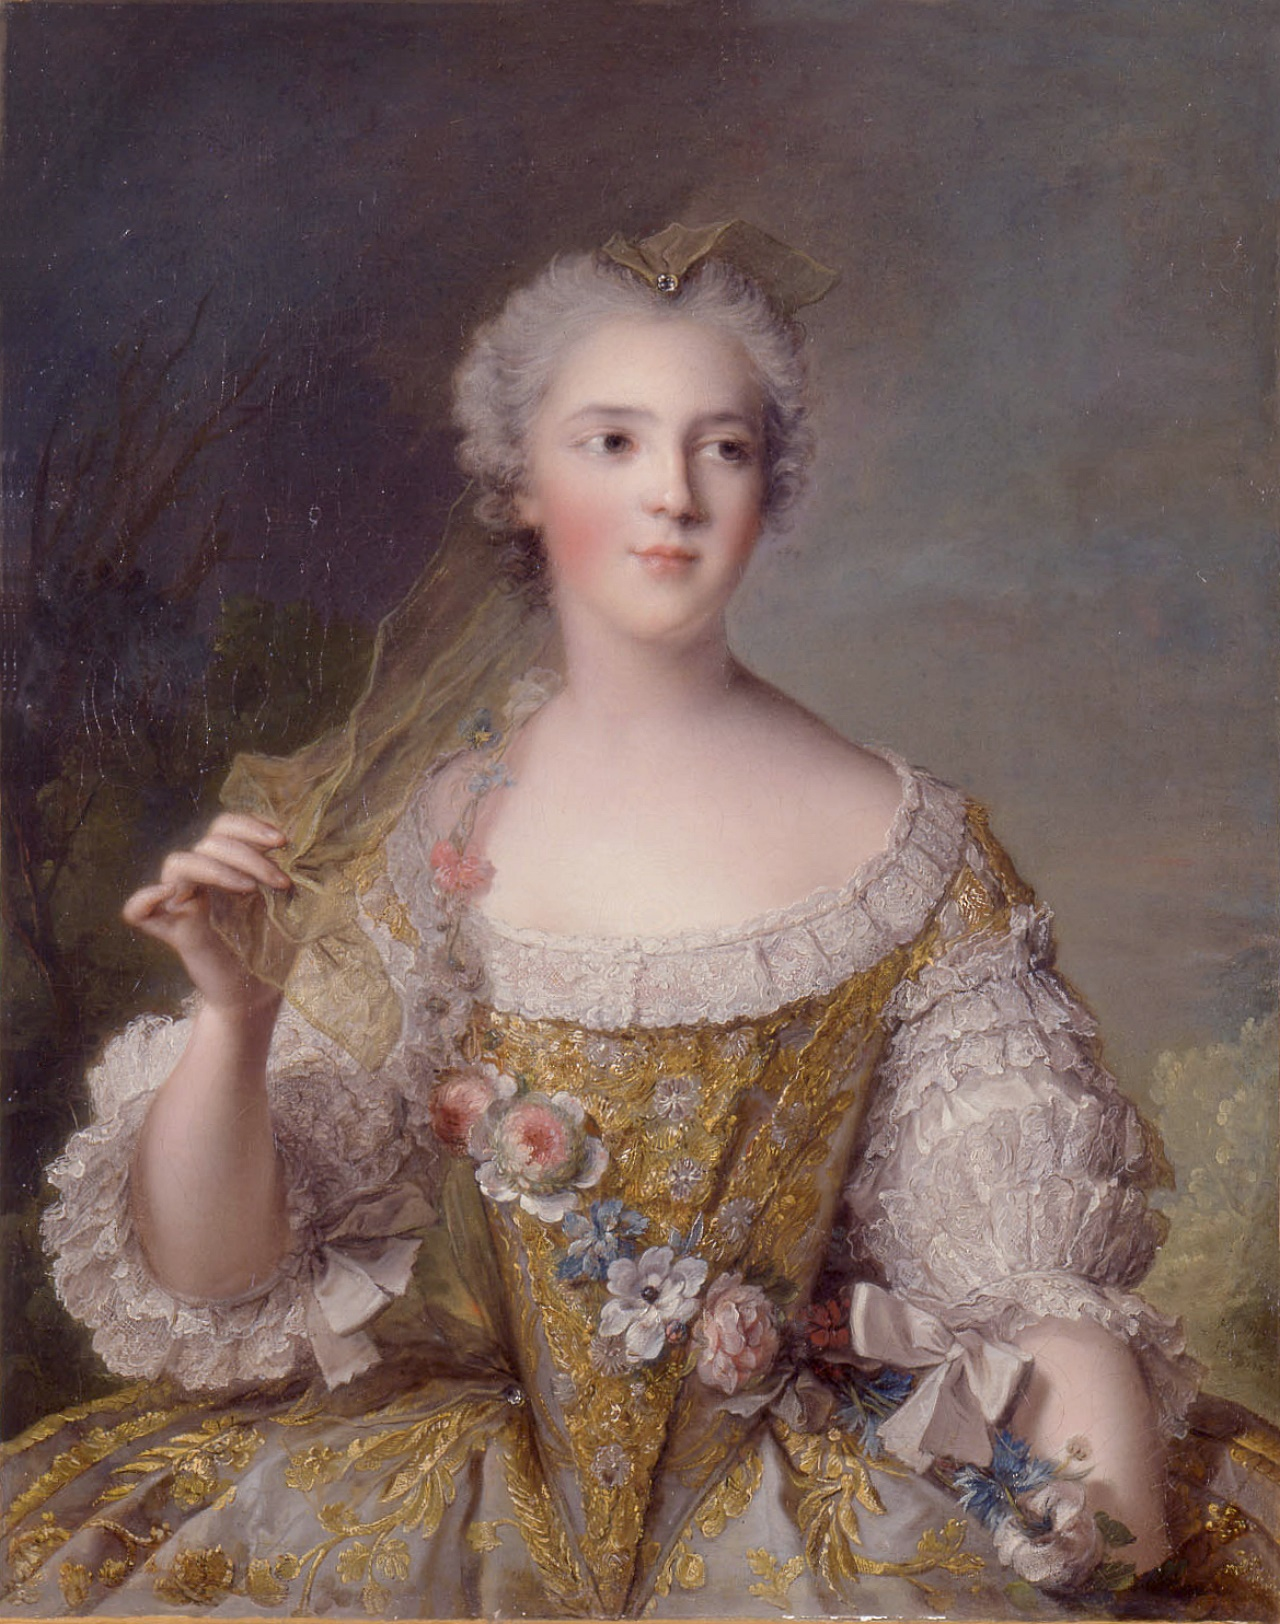 Jean-Marc_Nattier,_Madame_Sophie_de_France_(1748)_-_01.jpg